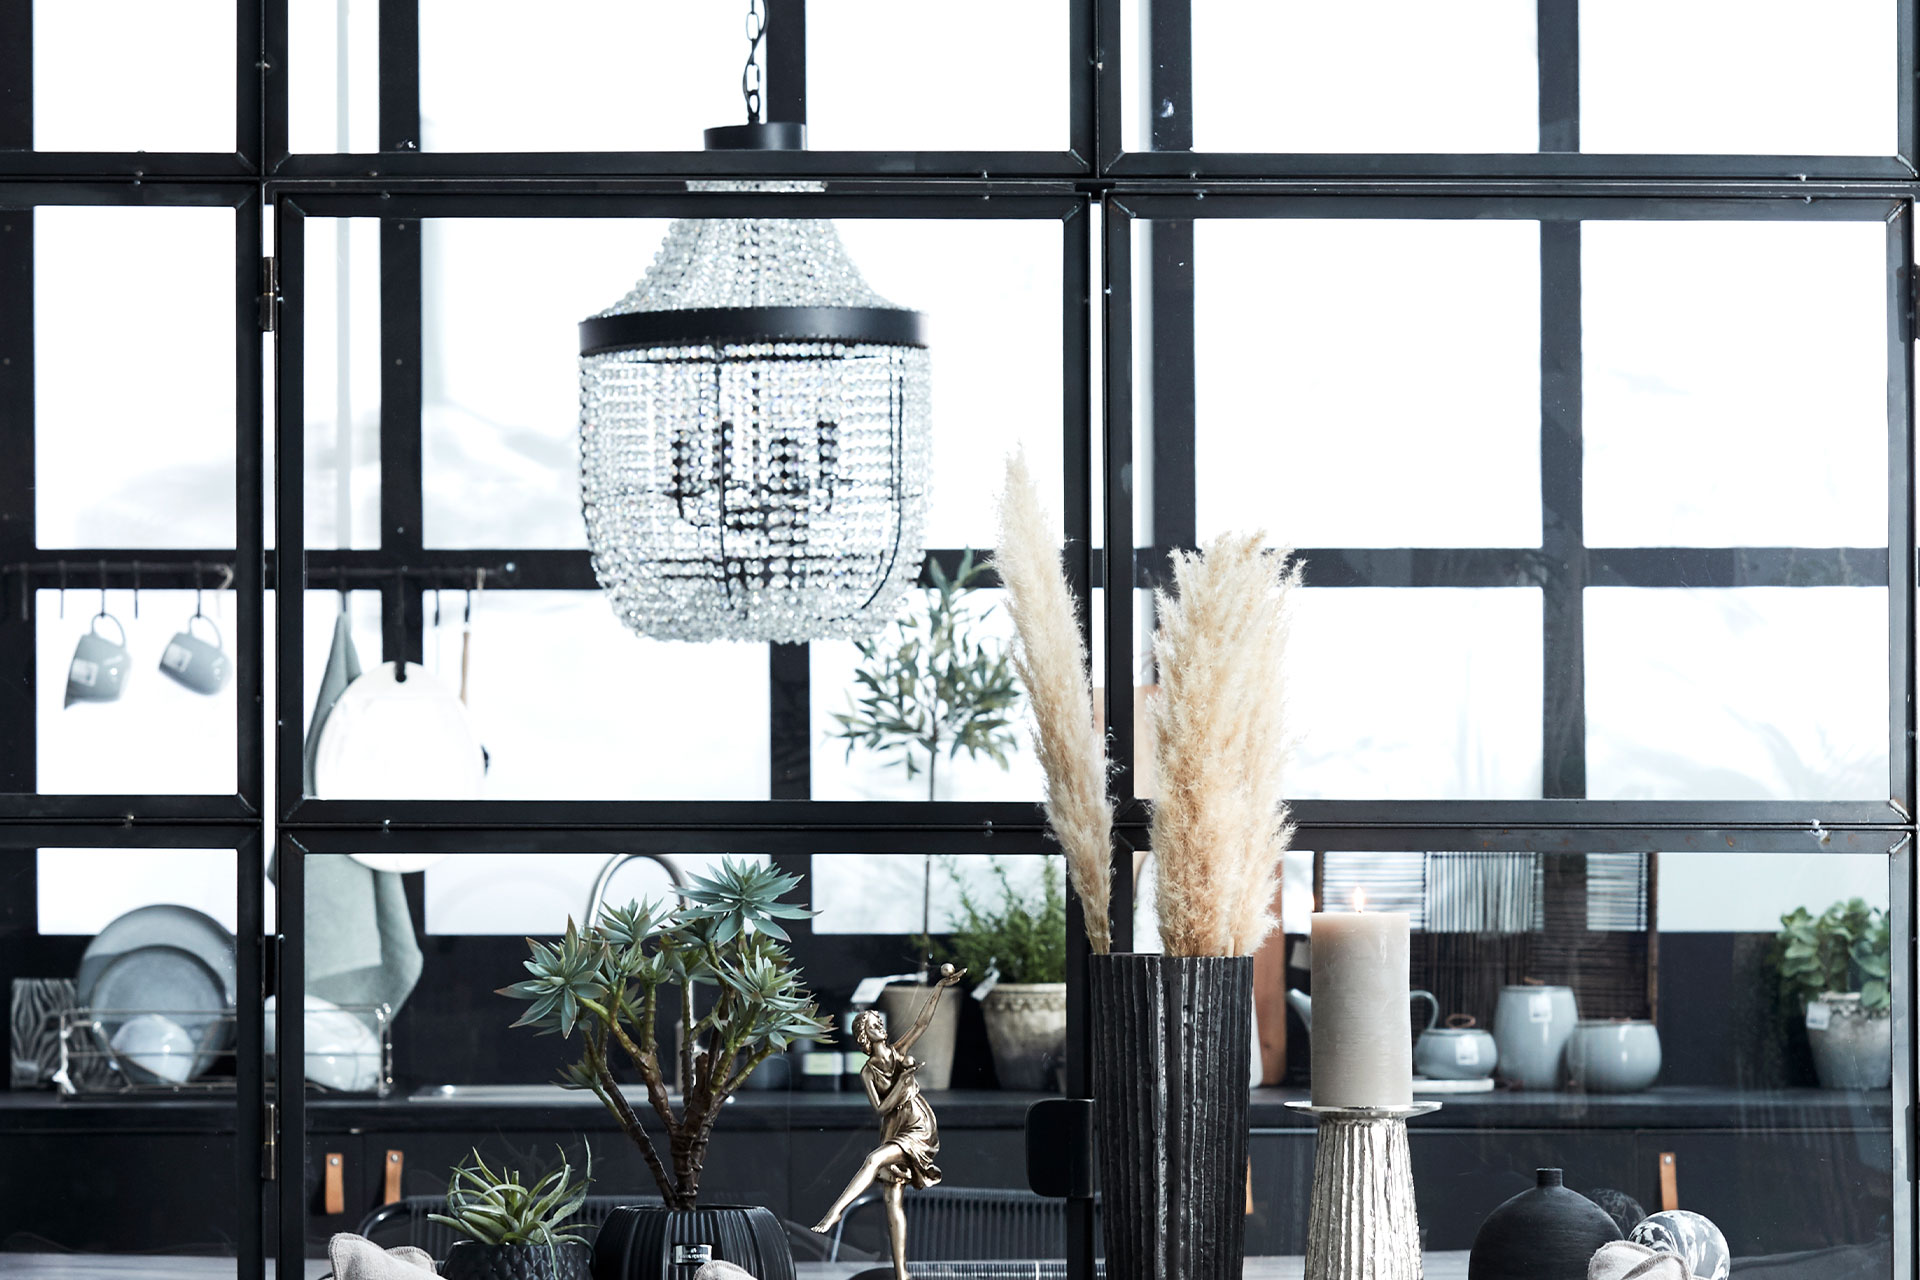 Wholesaler of Danish designed chandeliers - Lene Bjerre